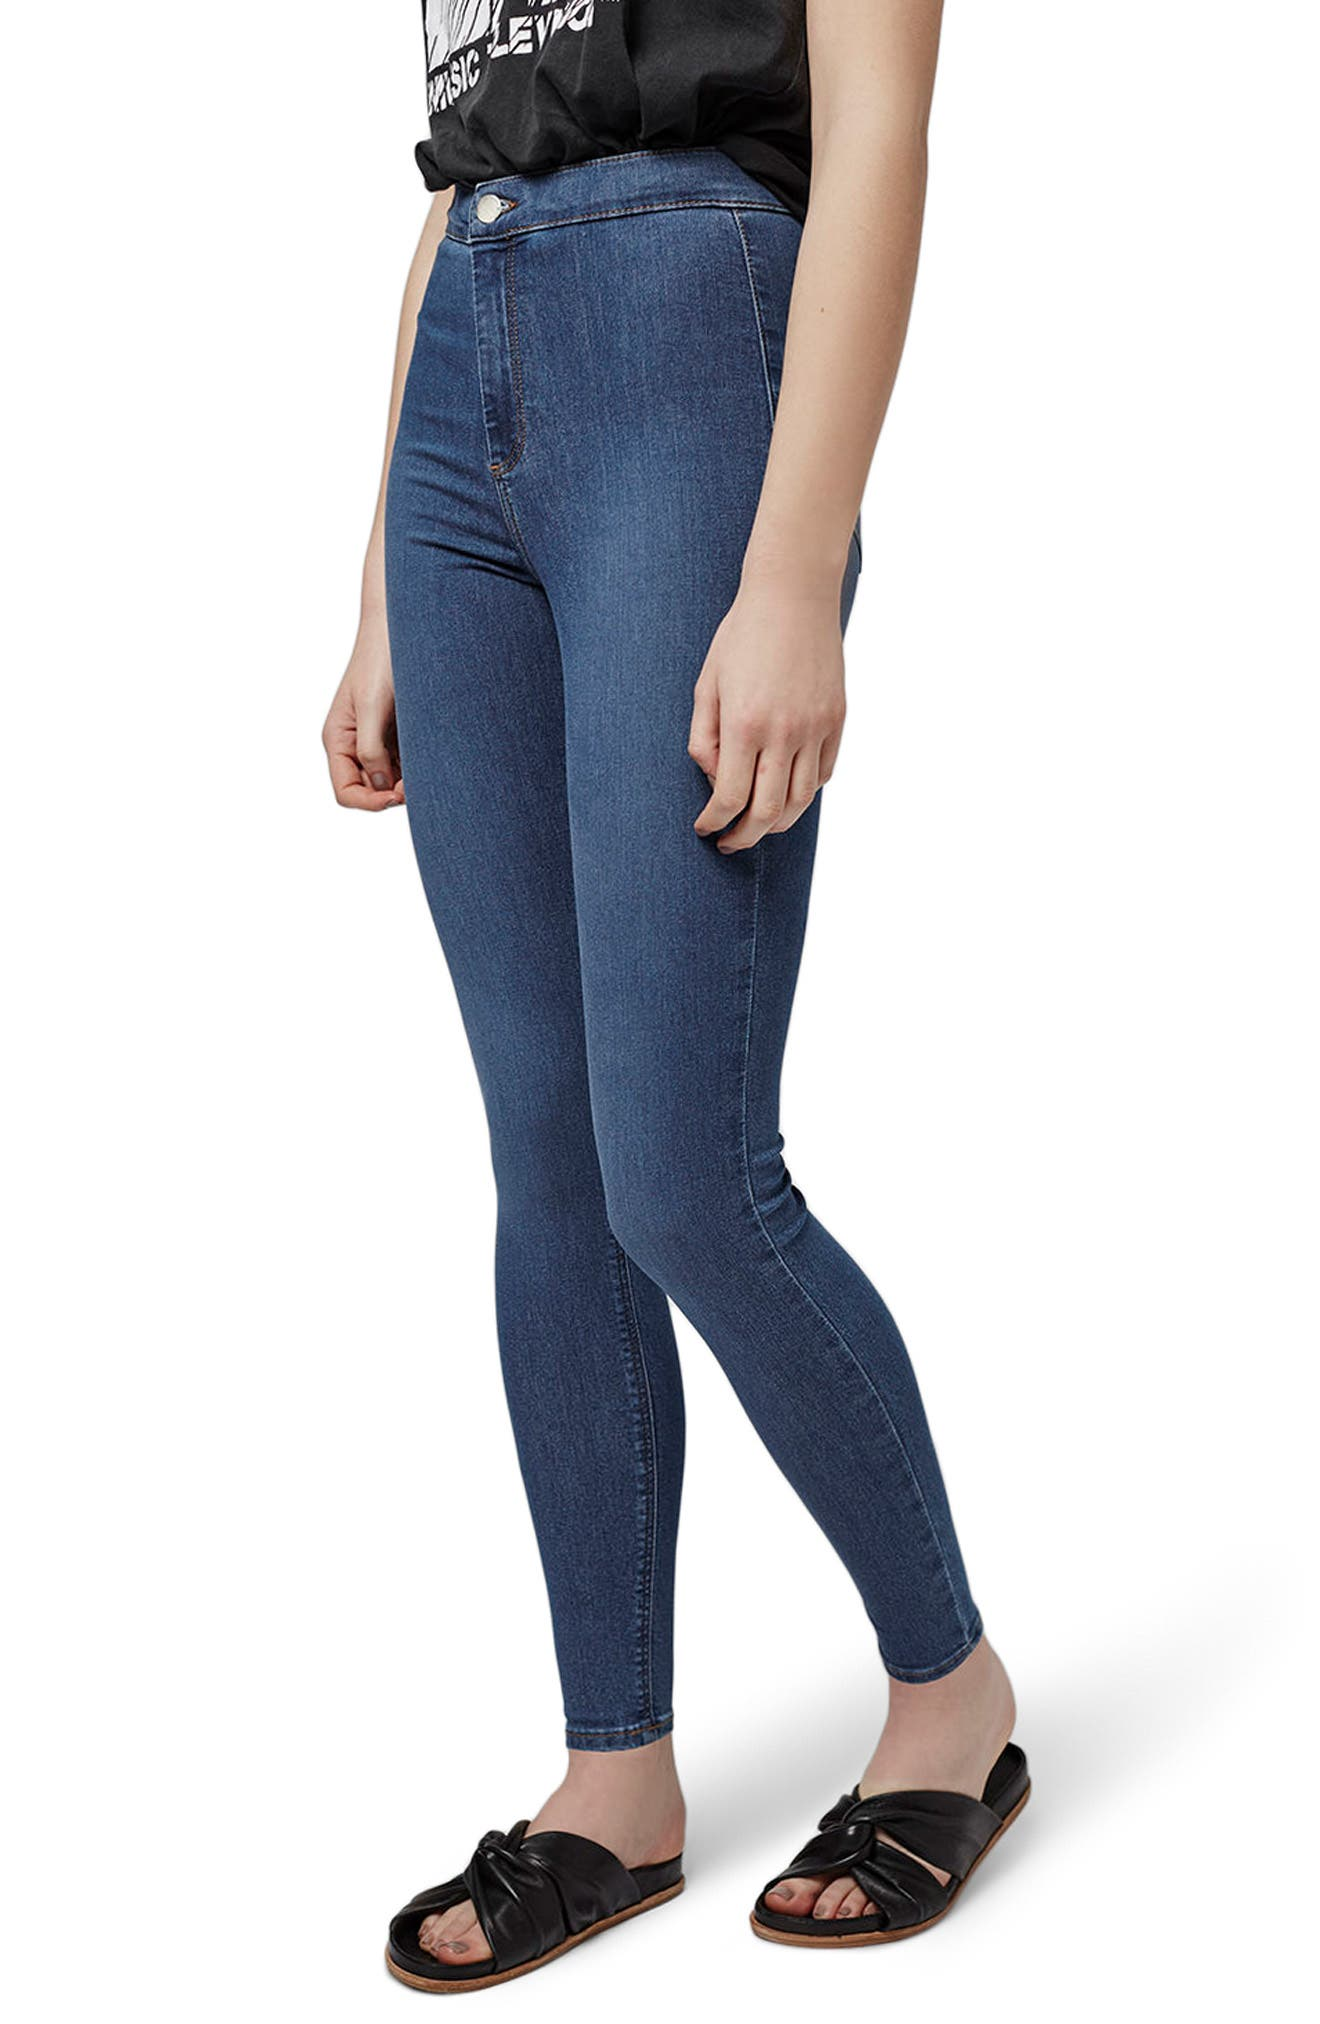 Joni Mid Denim Jeans,                             Alternate thumbnail 3, color,                             Mid Denim